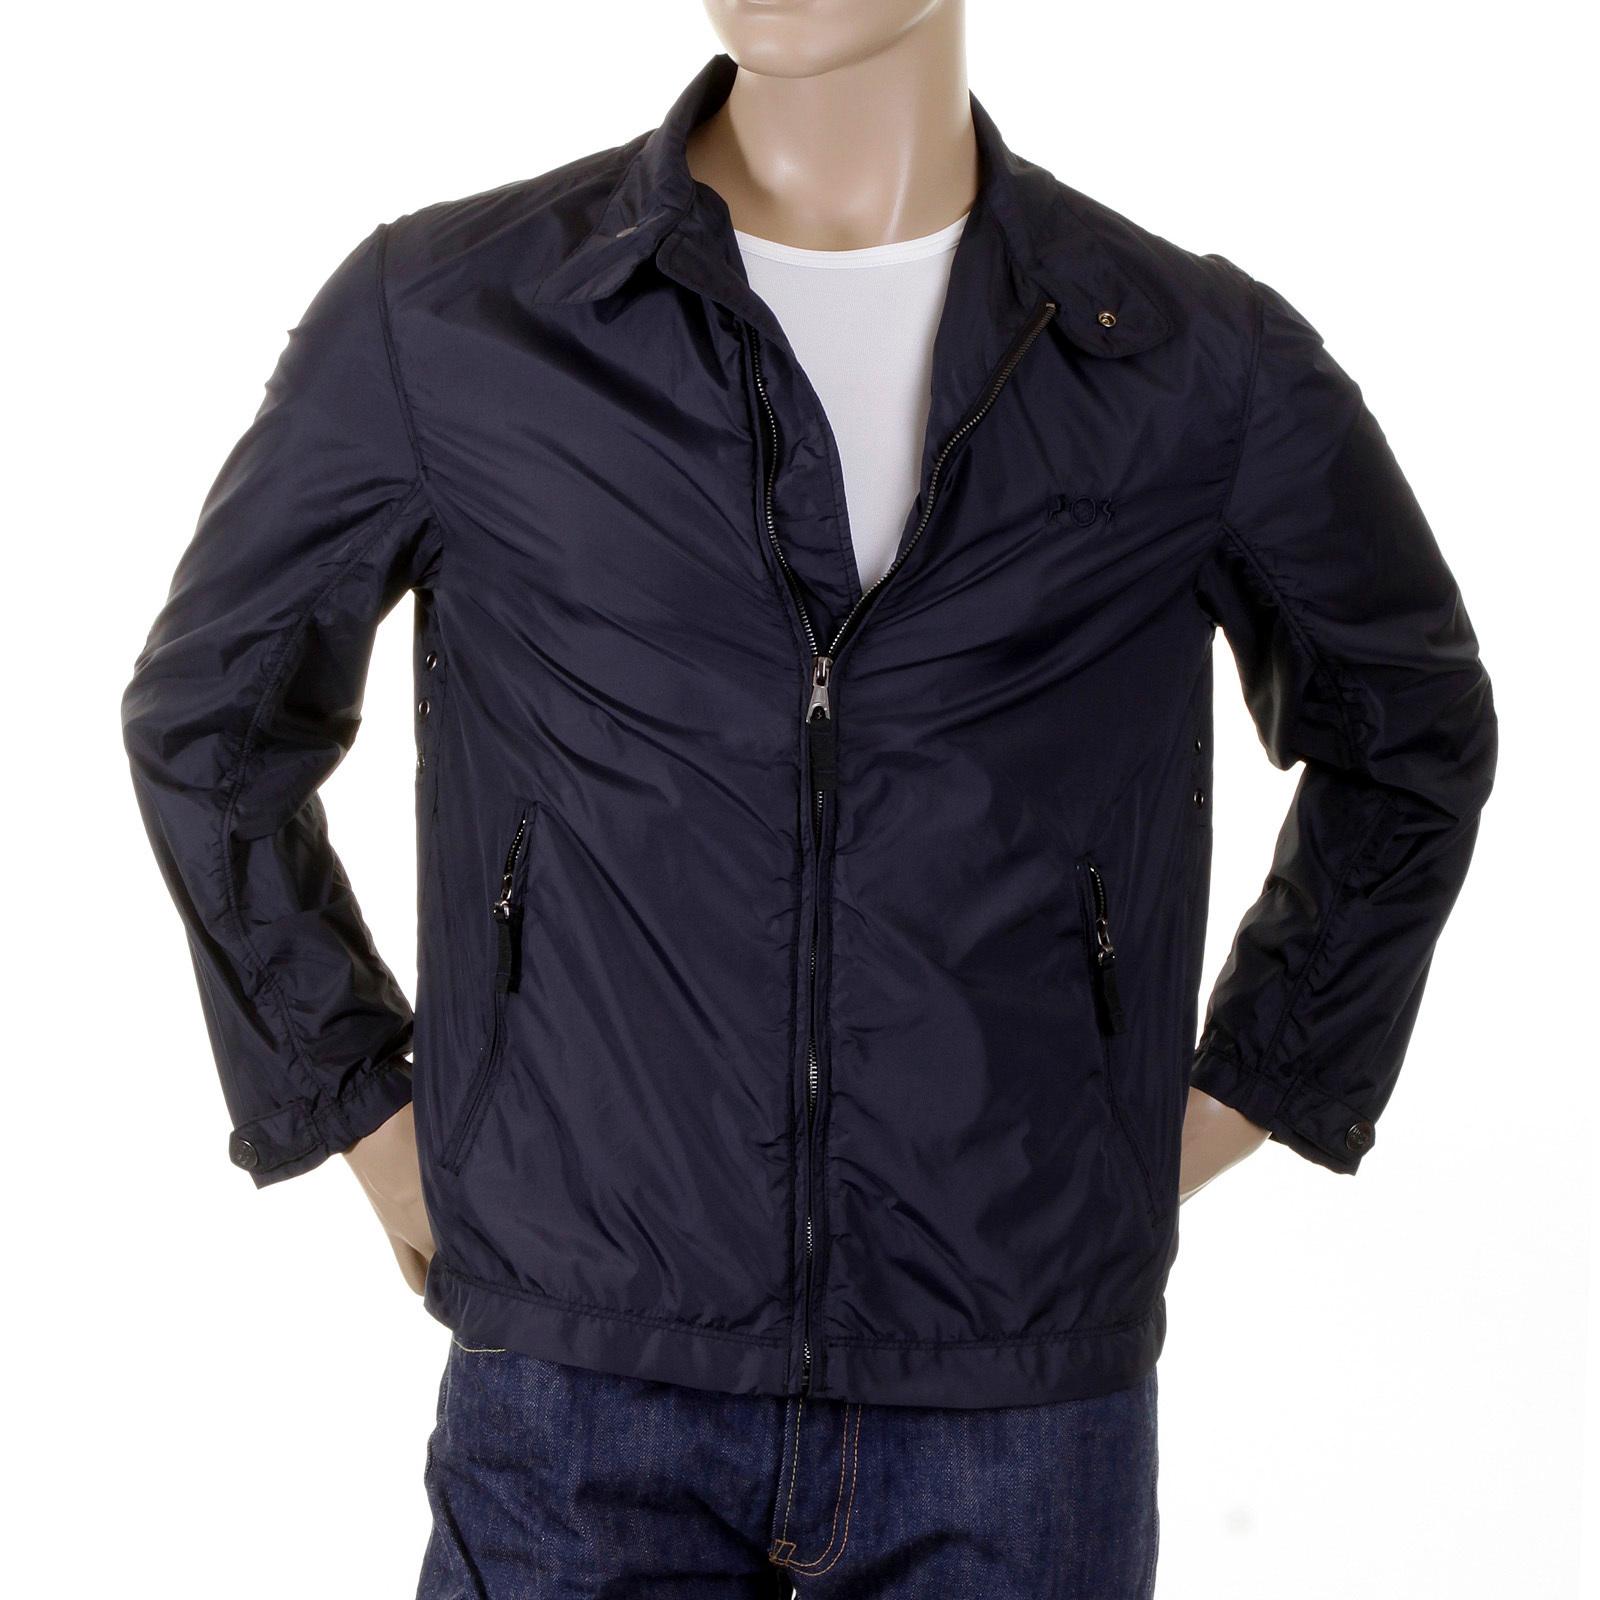 Navy Lightweight Jacket - Pl Jackets